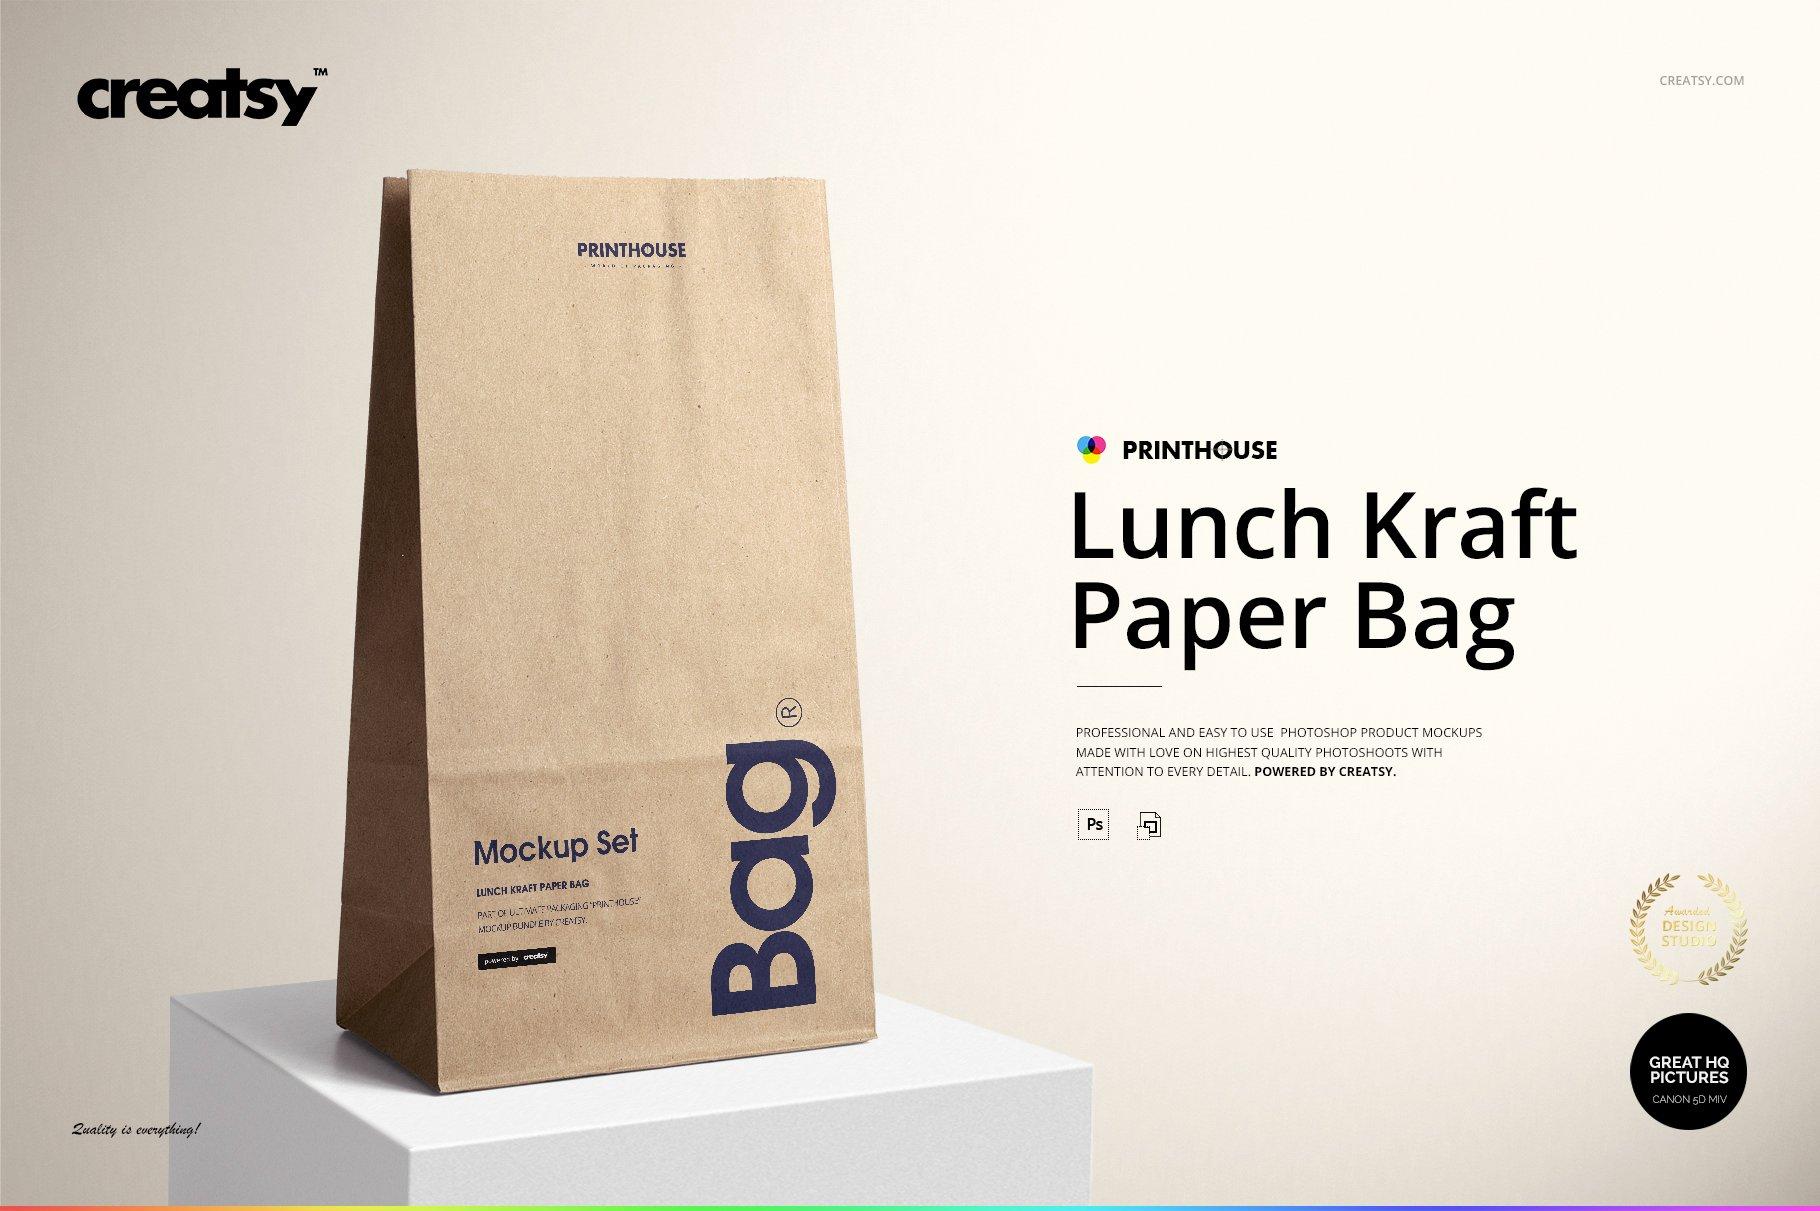 lunch kraft paper bag mockup set  creative photoshop